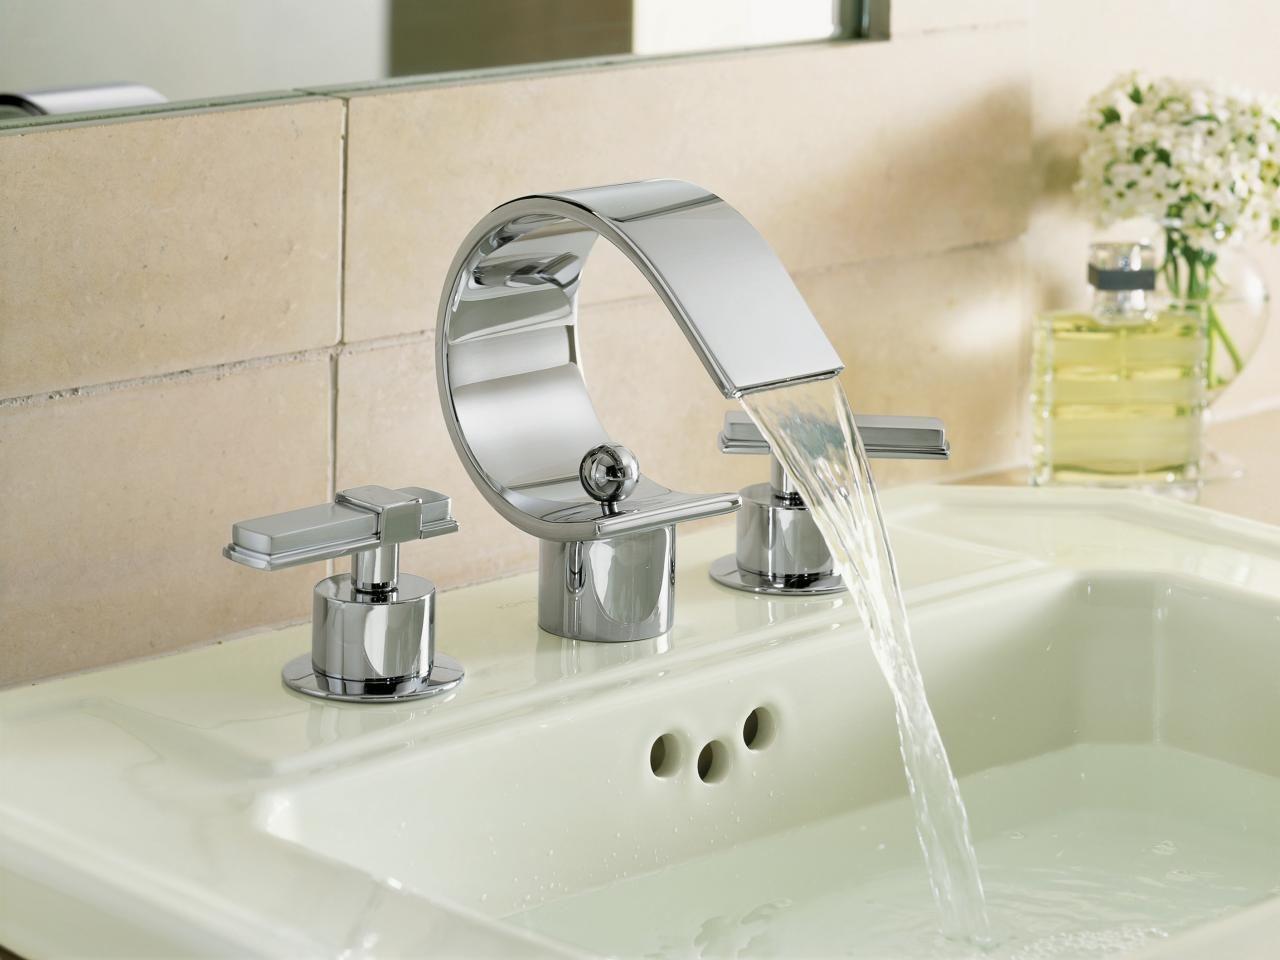 23 Aquafaucet Dfi Single Hole Bathroom Faucet Best Bathroom